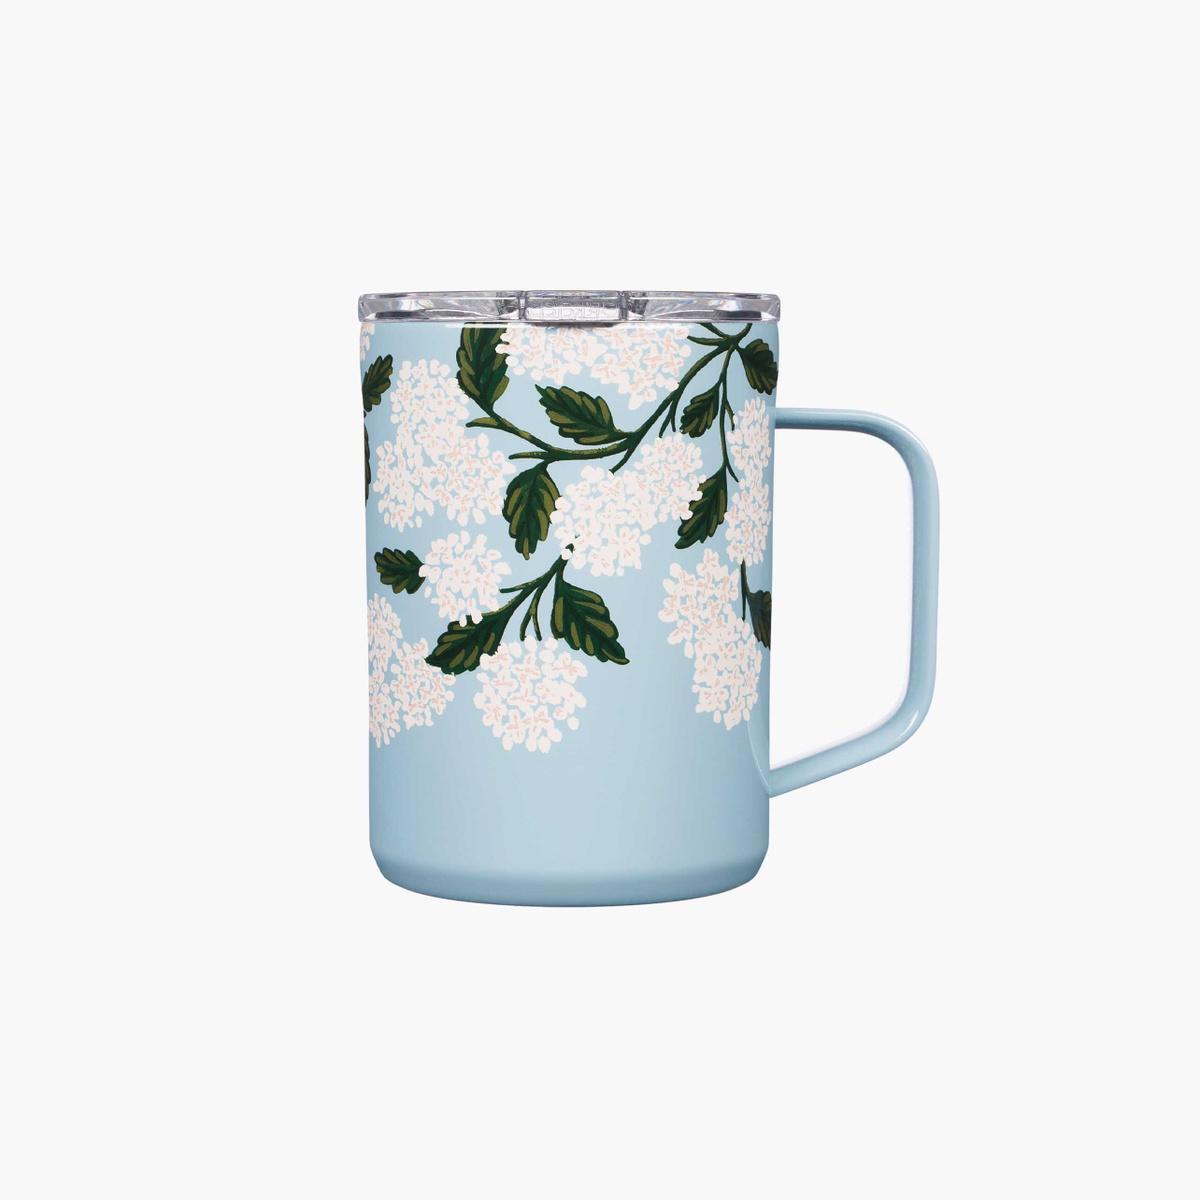 Corkcicle - CO Corkcicle x Rifle Paper - Blue Hydrangea Mug